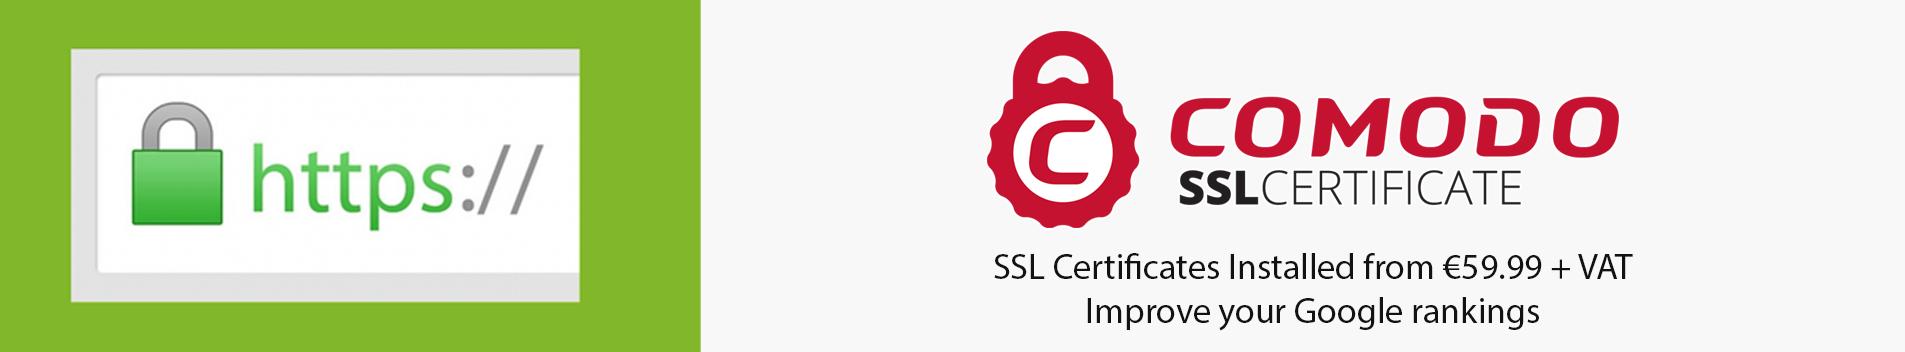 ssl certificate dublin